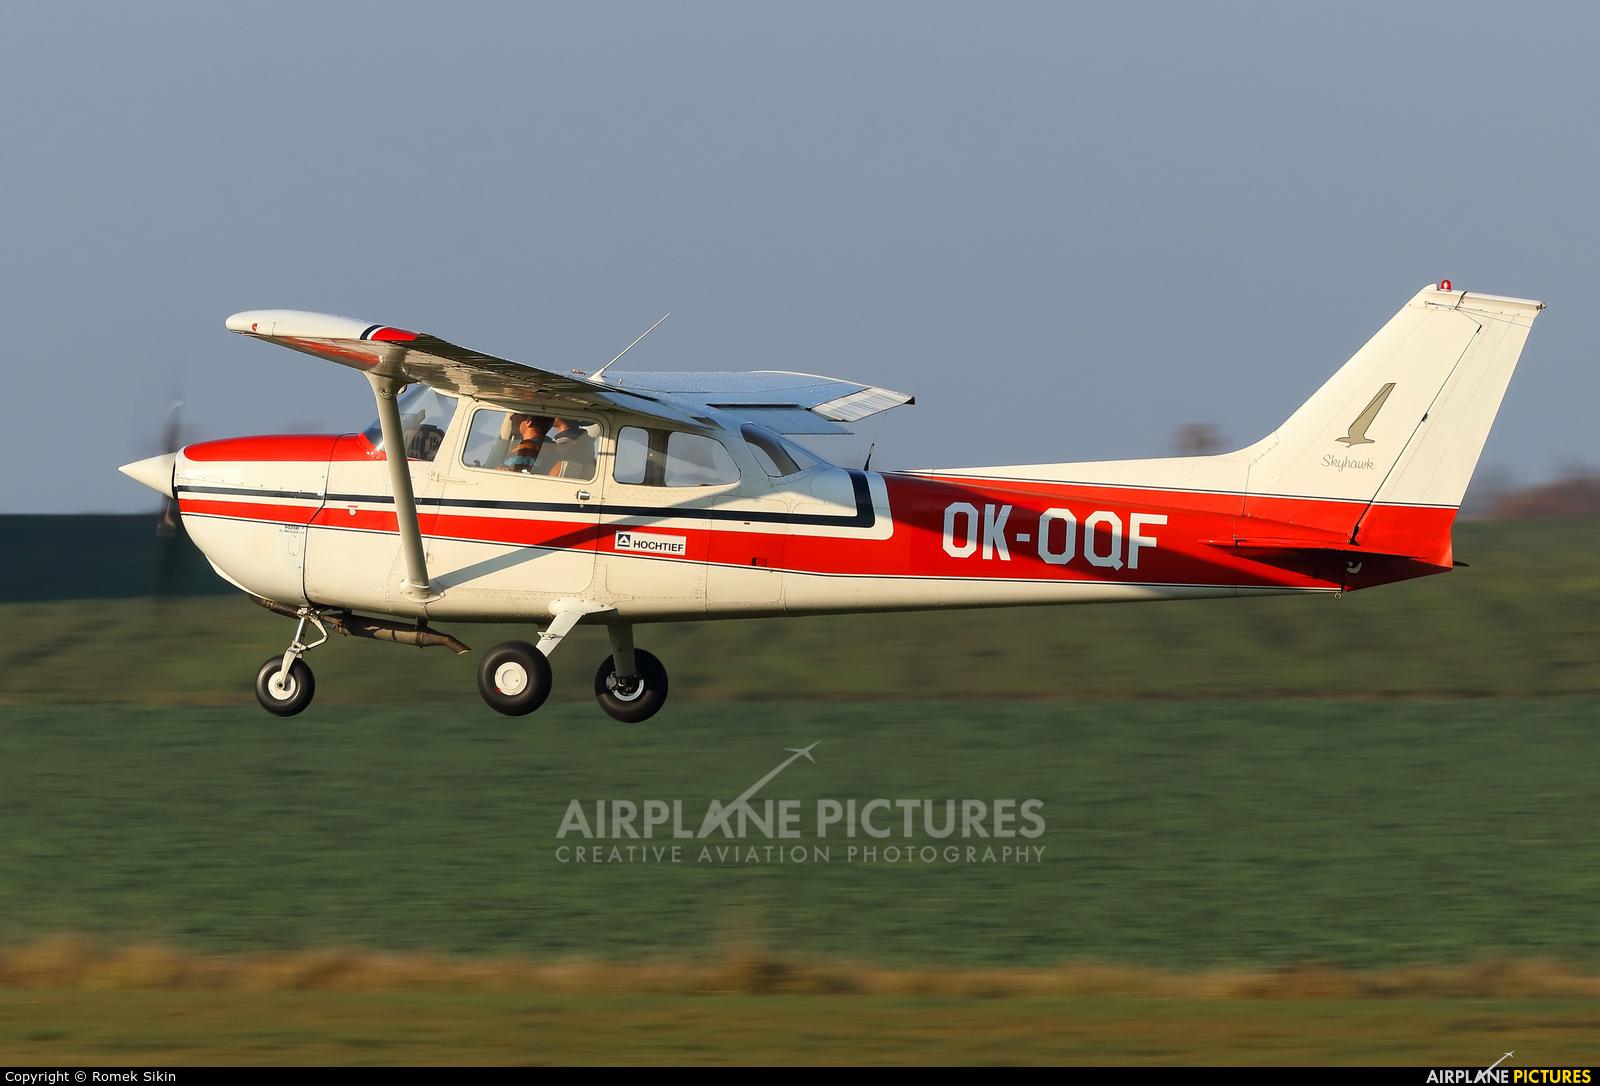 Aeroklub Czech Republic OK-OQF aircraft at Zábřeh